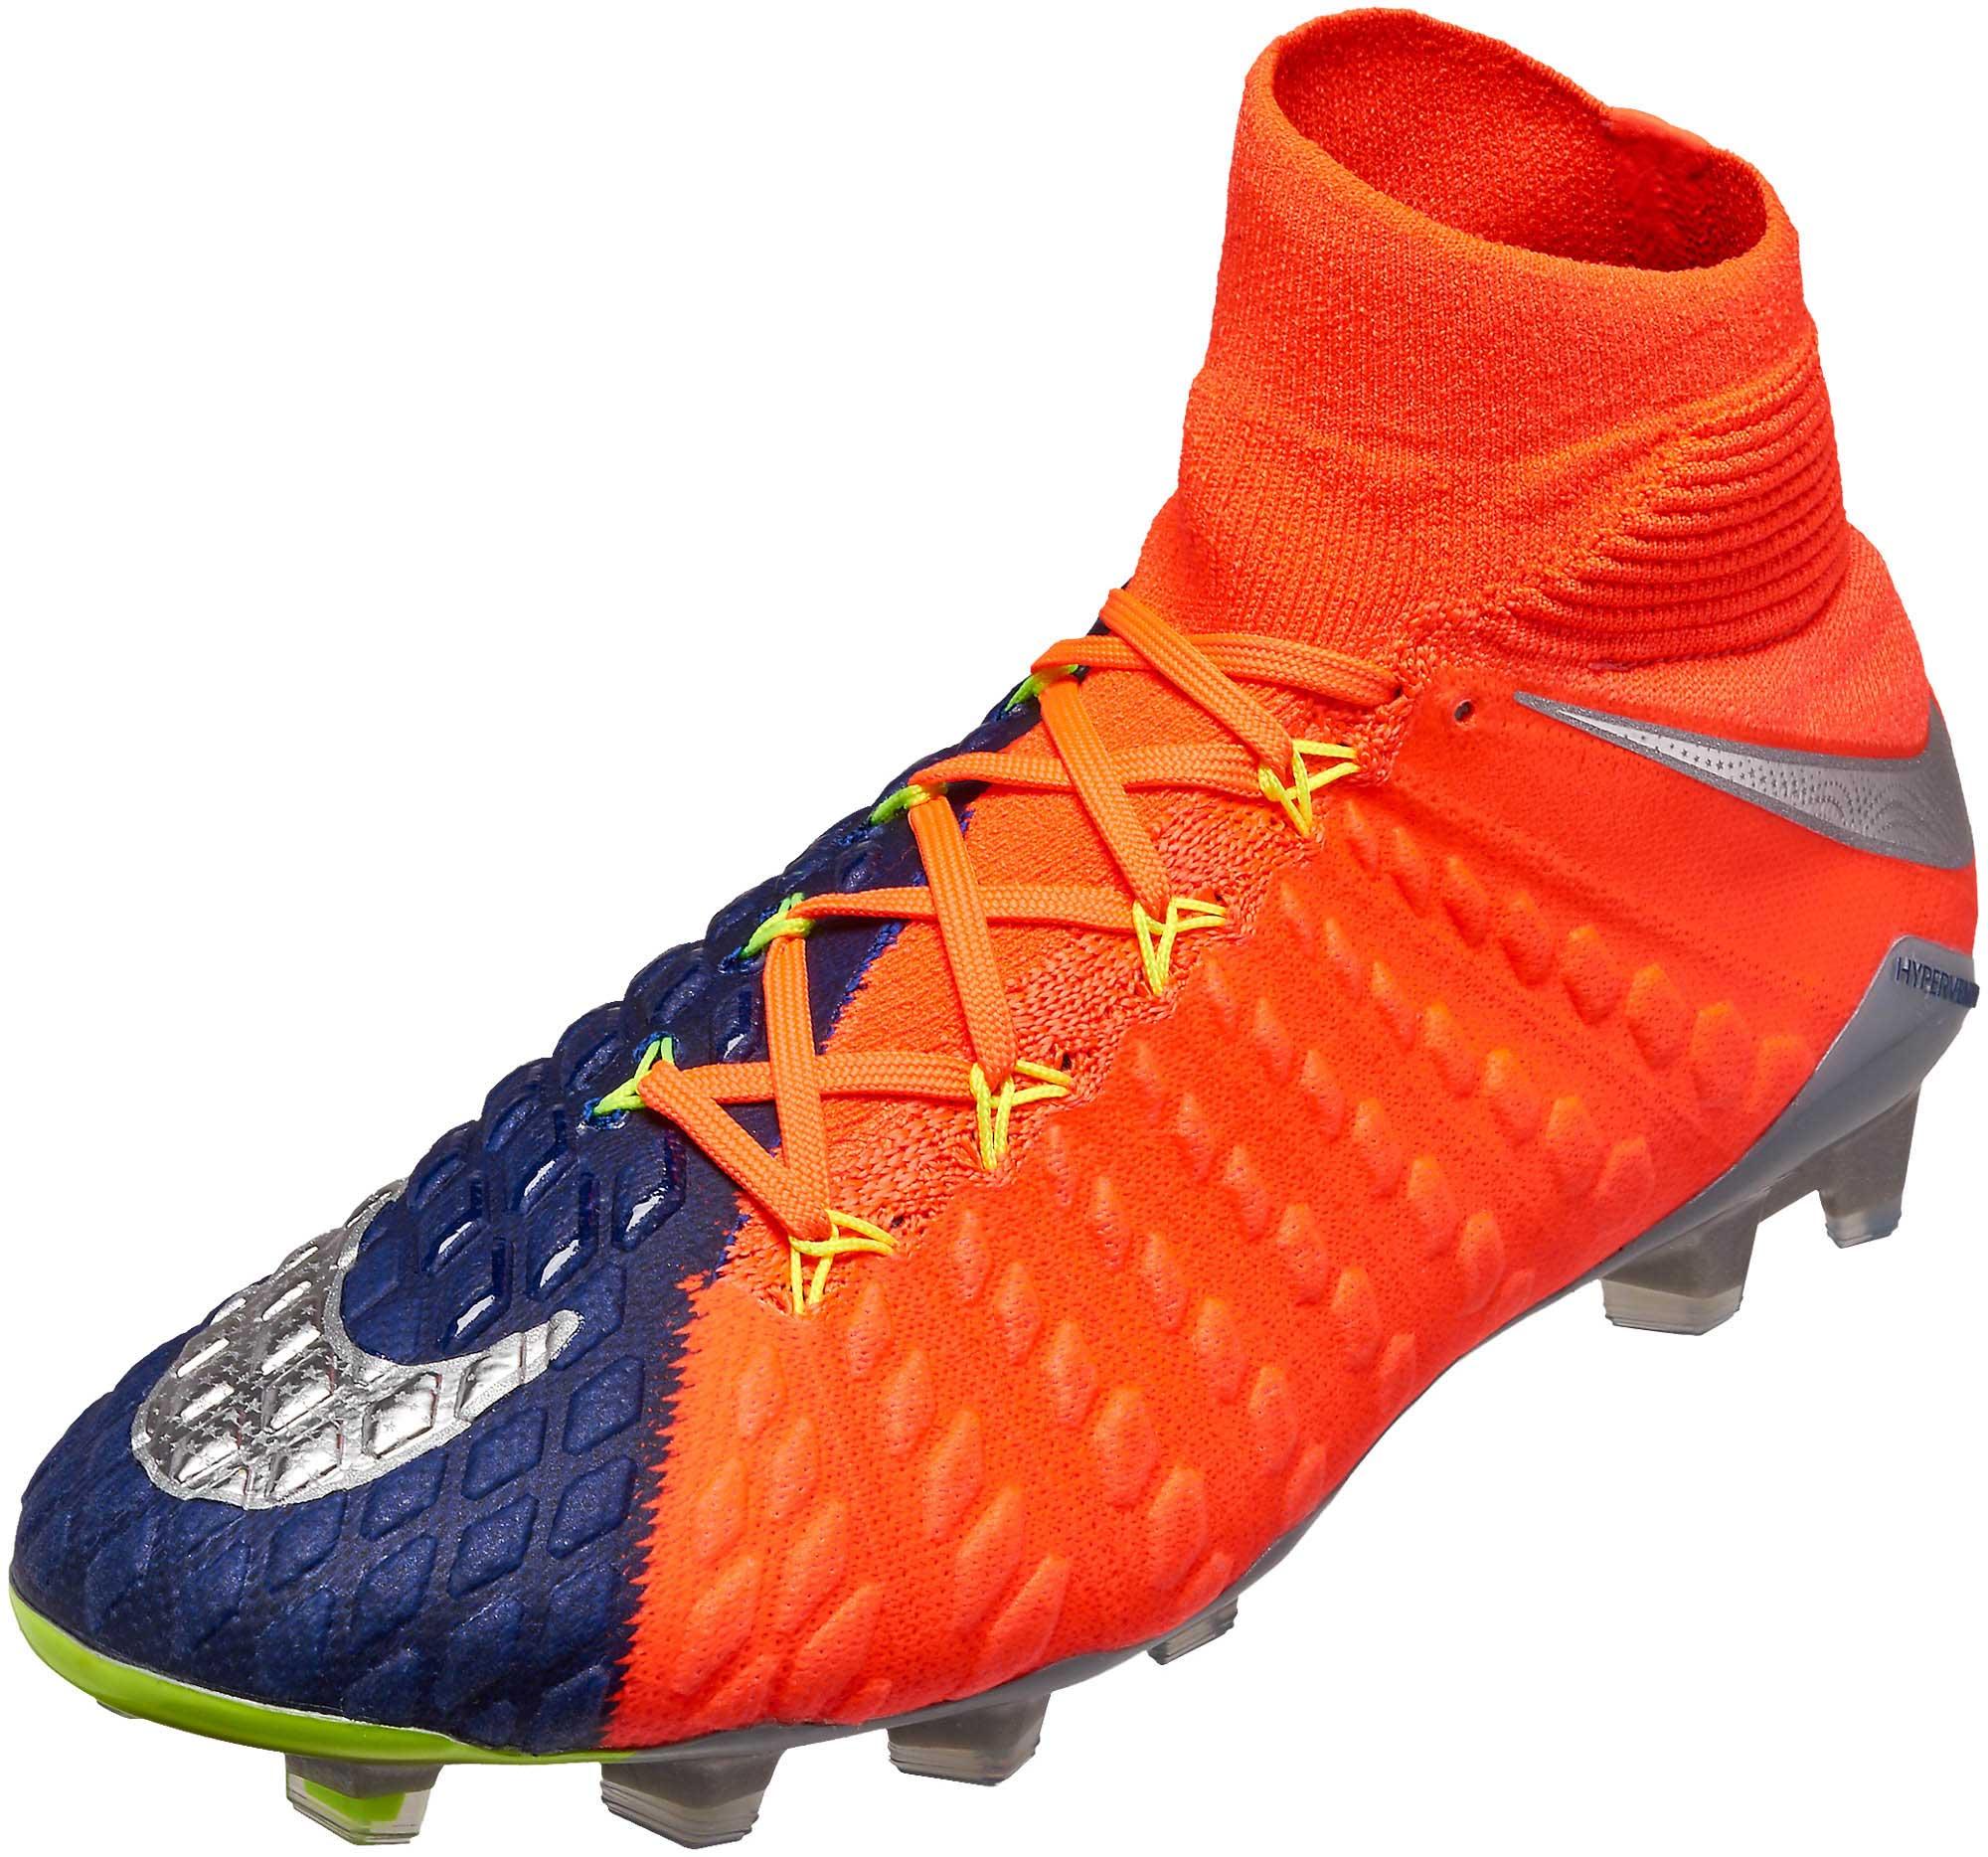 low priced 2ad38 31cd4 Nike Hypervenom Phantom III DF FG Soccer Cleats - Deep ...